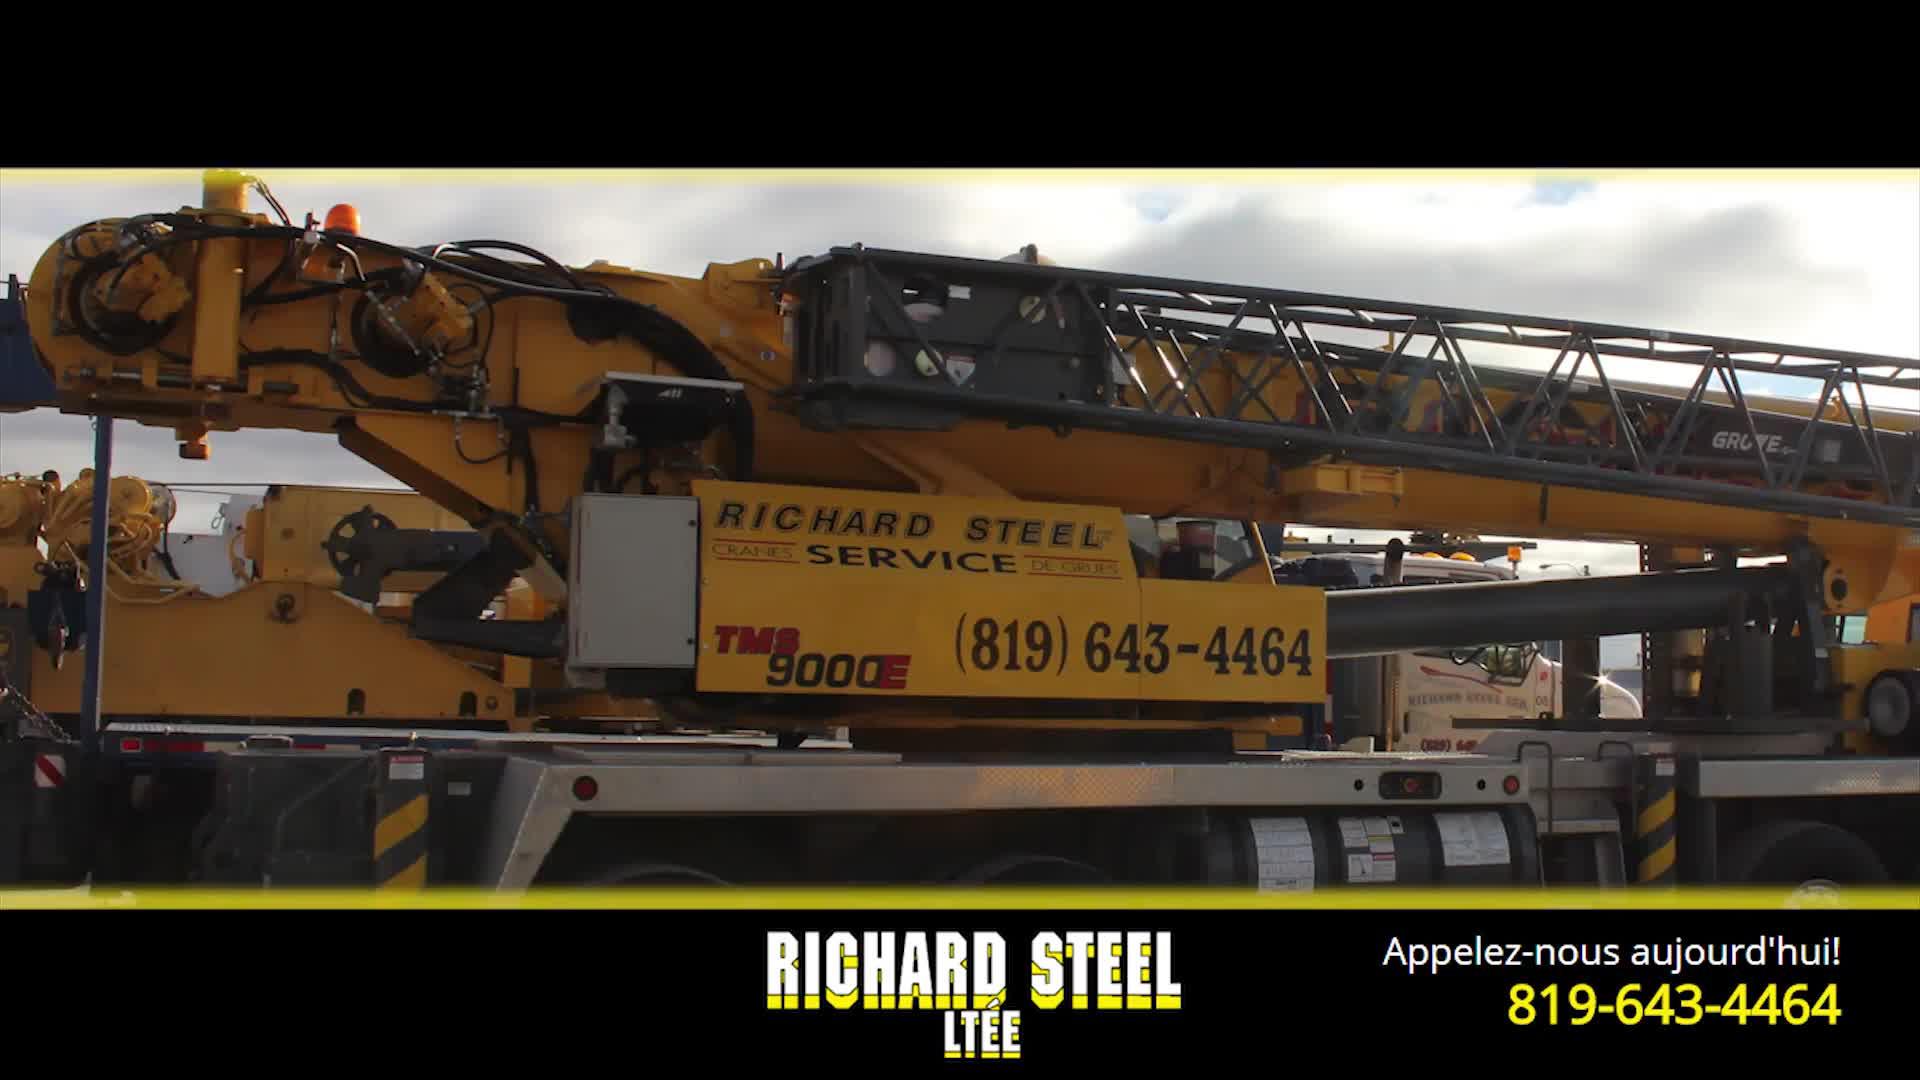 Richard Steel Ltée - Service et location de grues - 819-643-4464